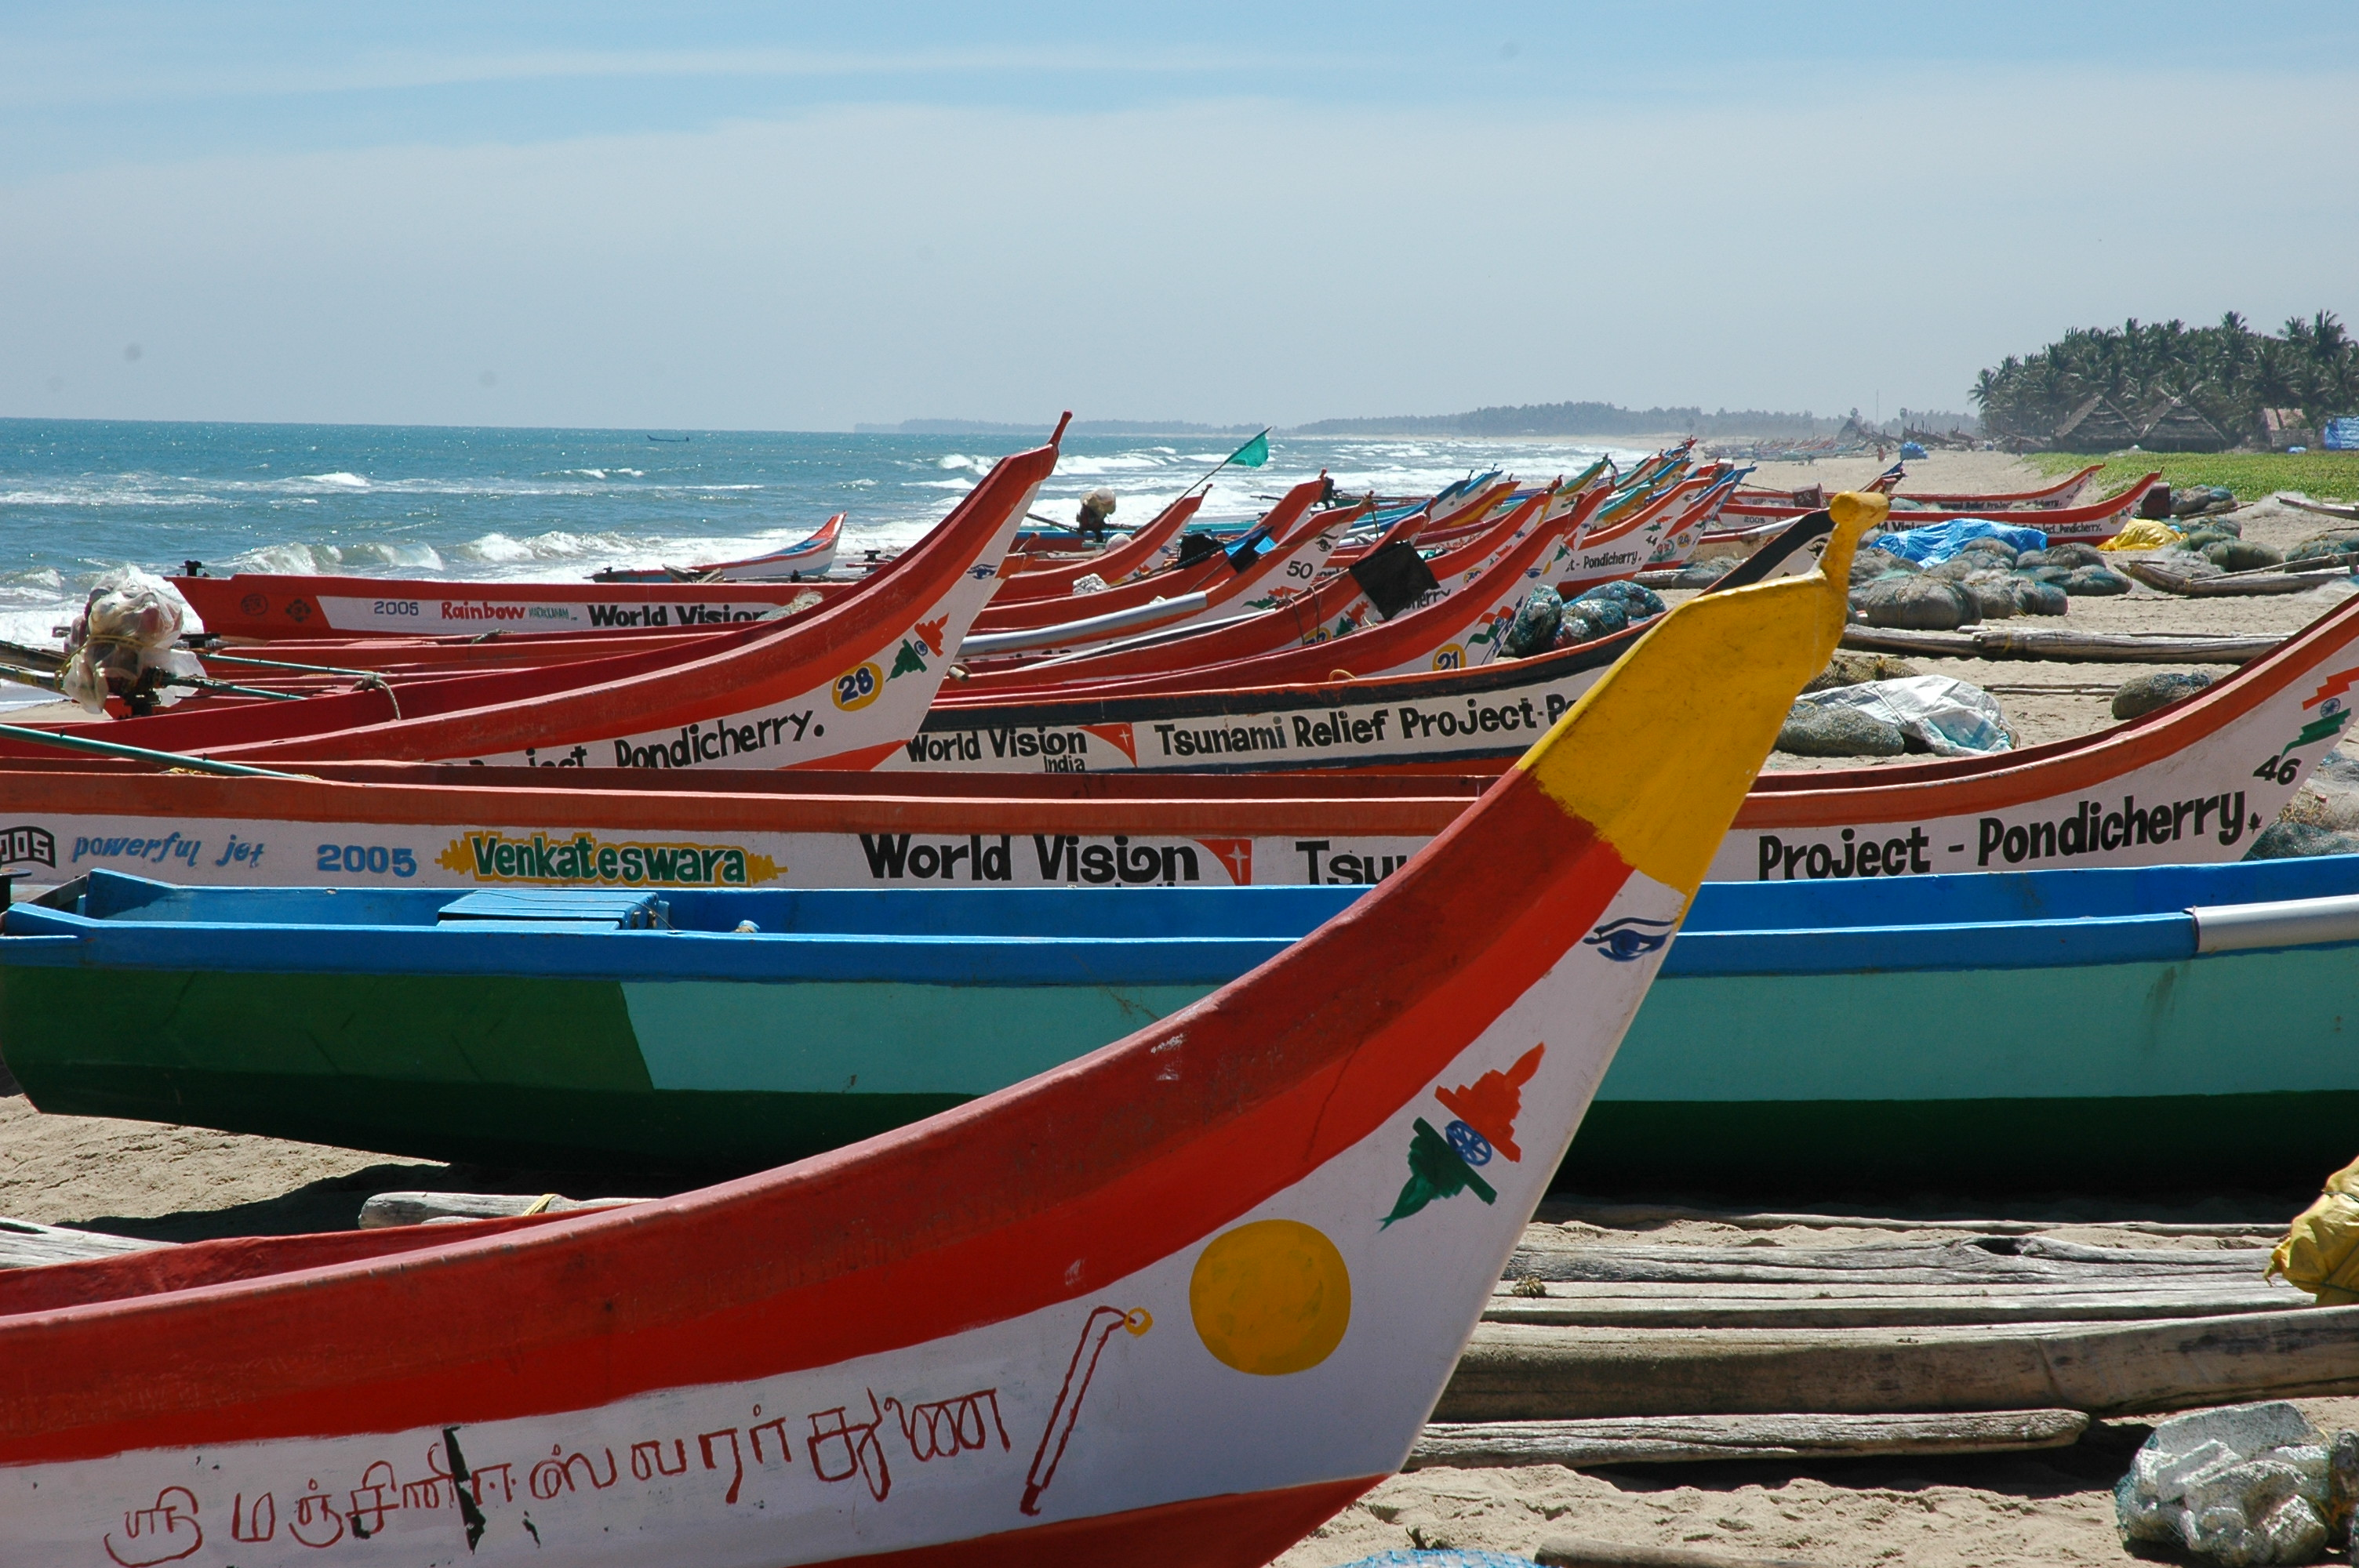 Pondicherry Fishing Boats